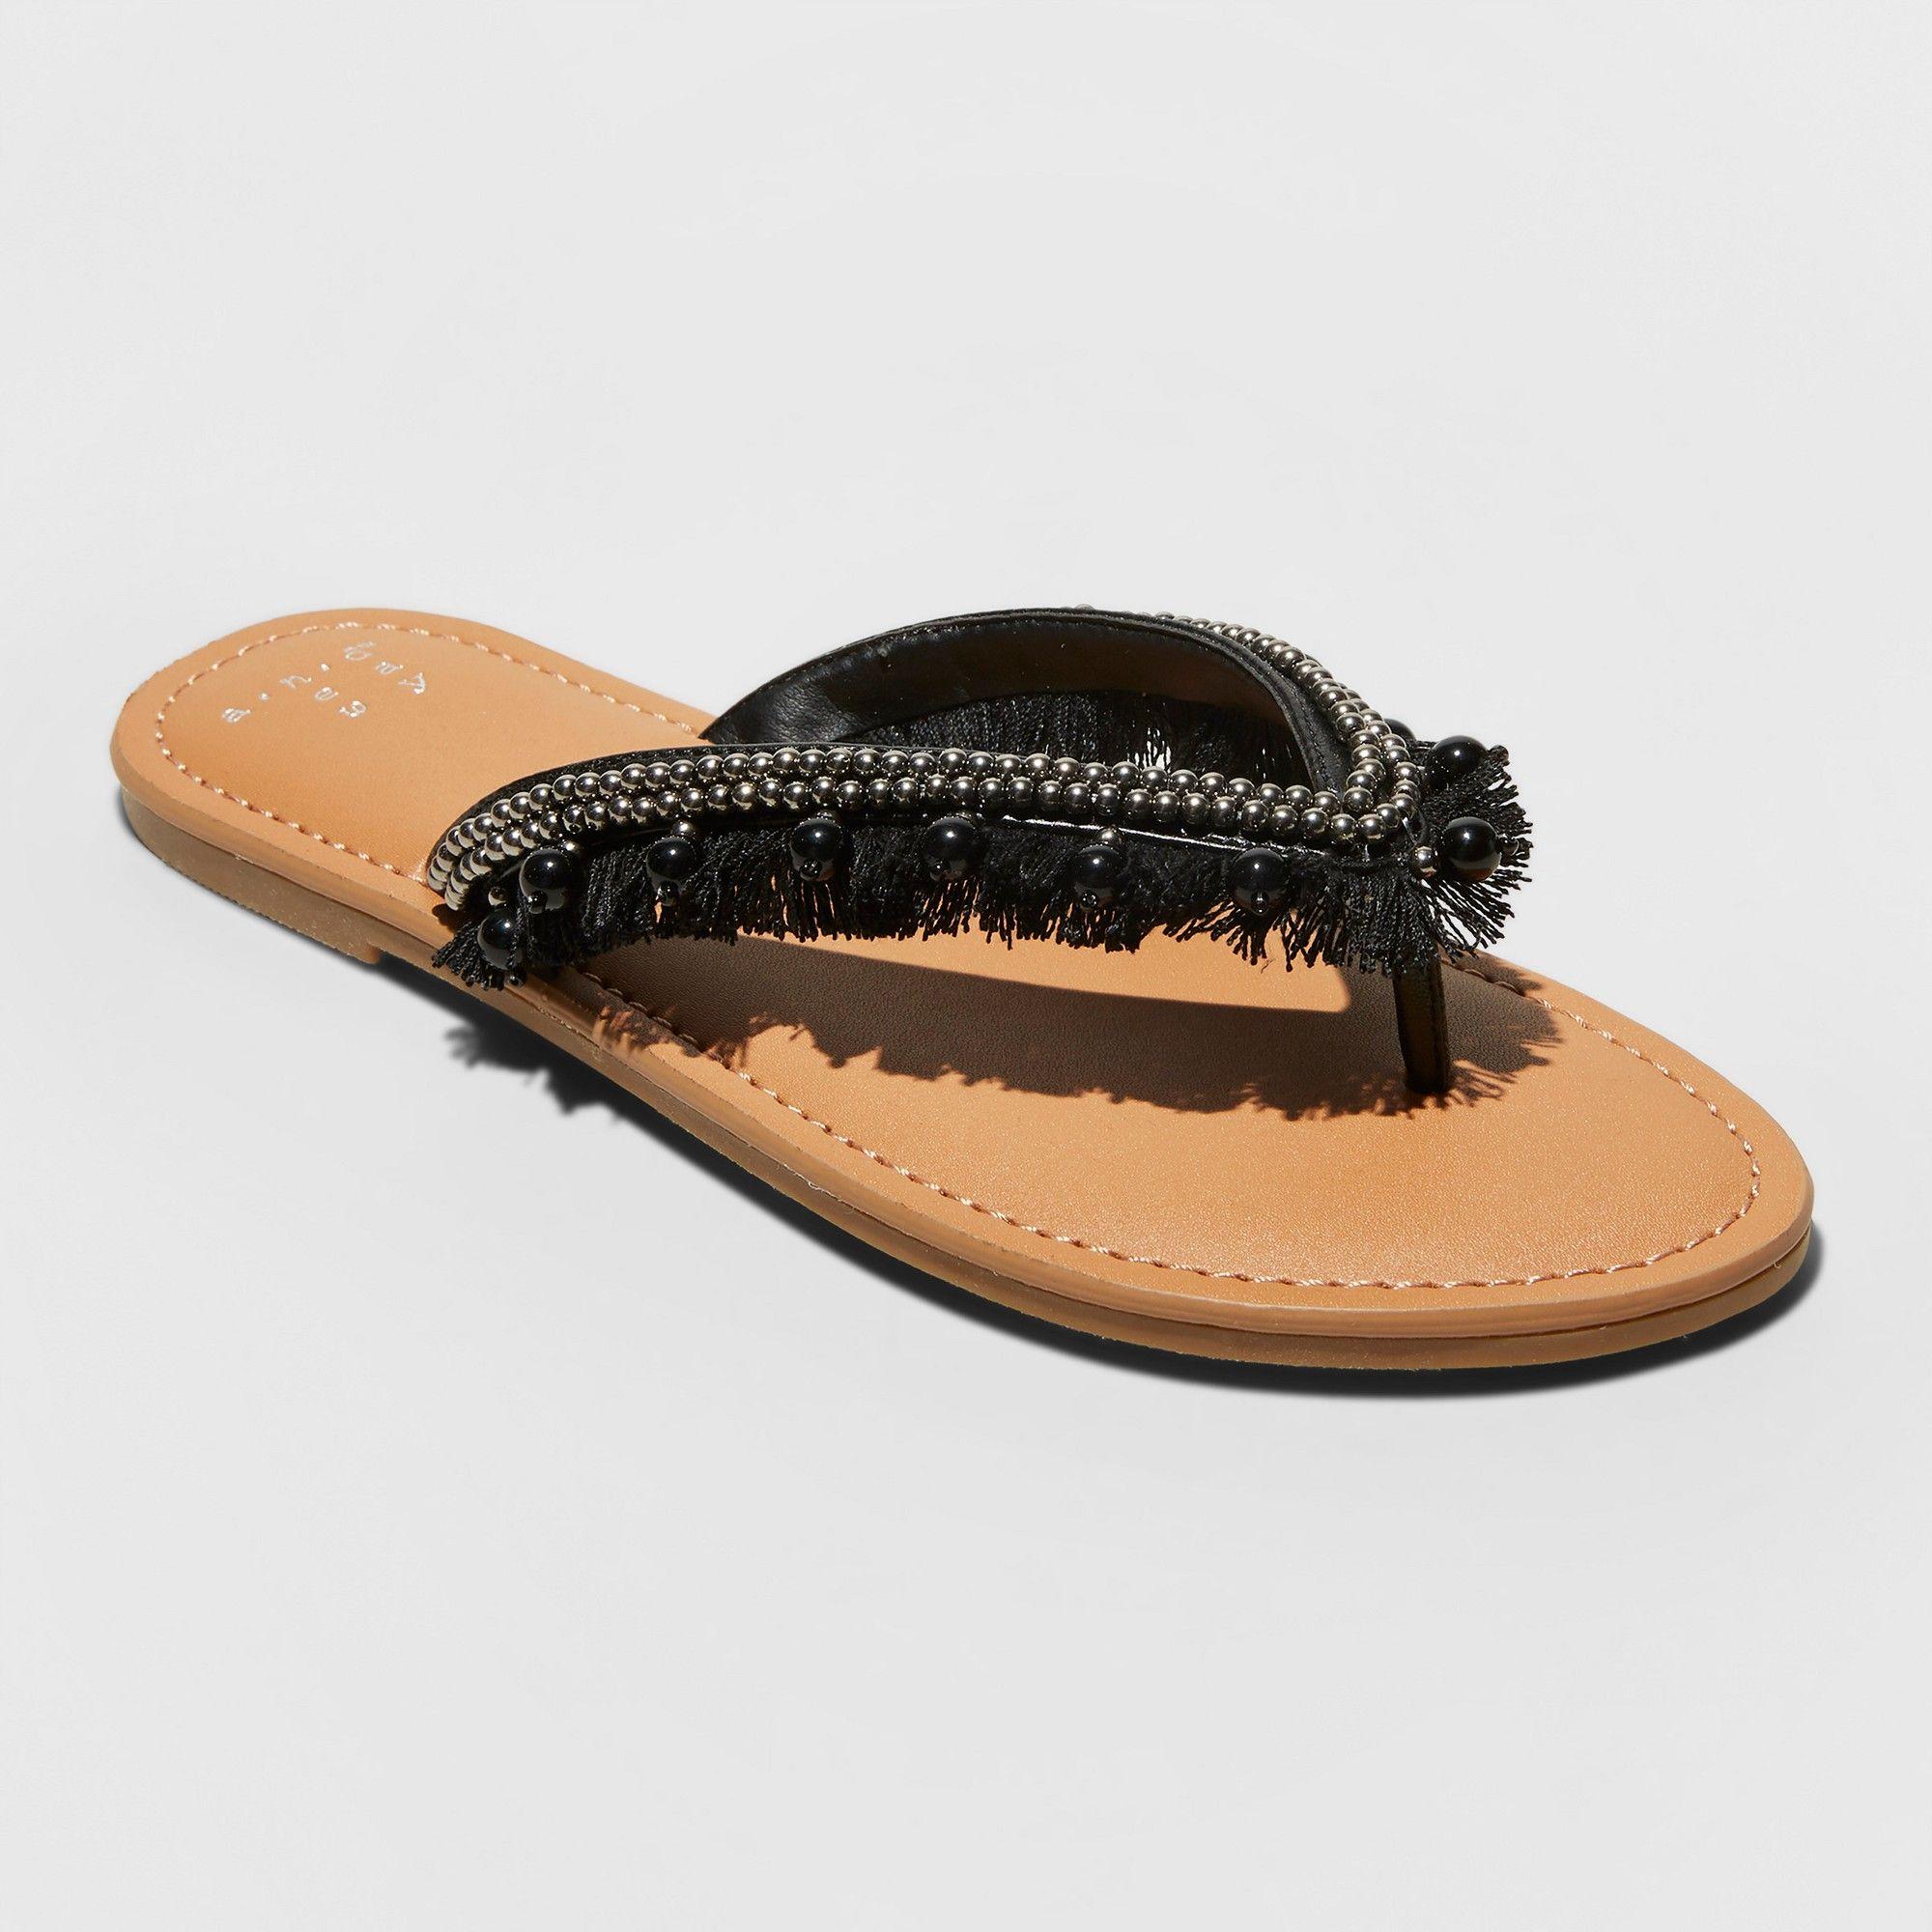 b5dbe057b9e Women s Alexis Beaded Fringe Thong Sandals - A New Day Black 7.5